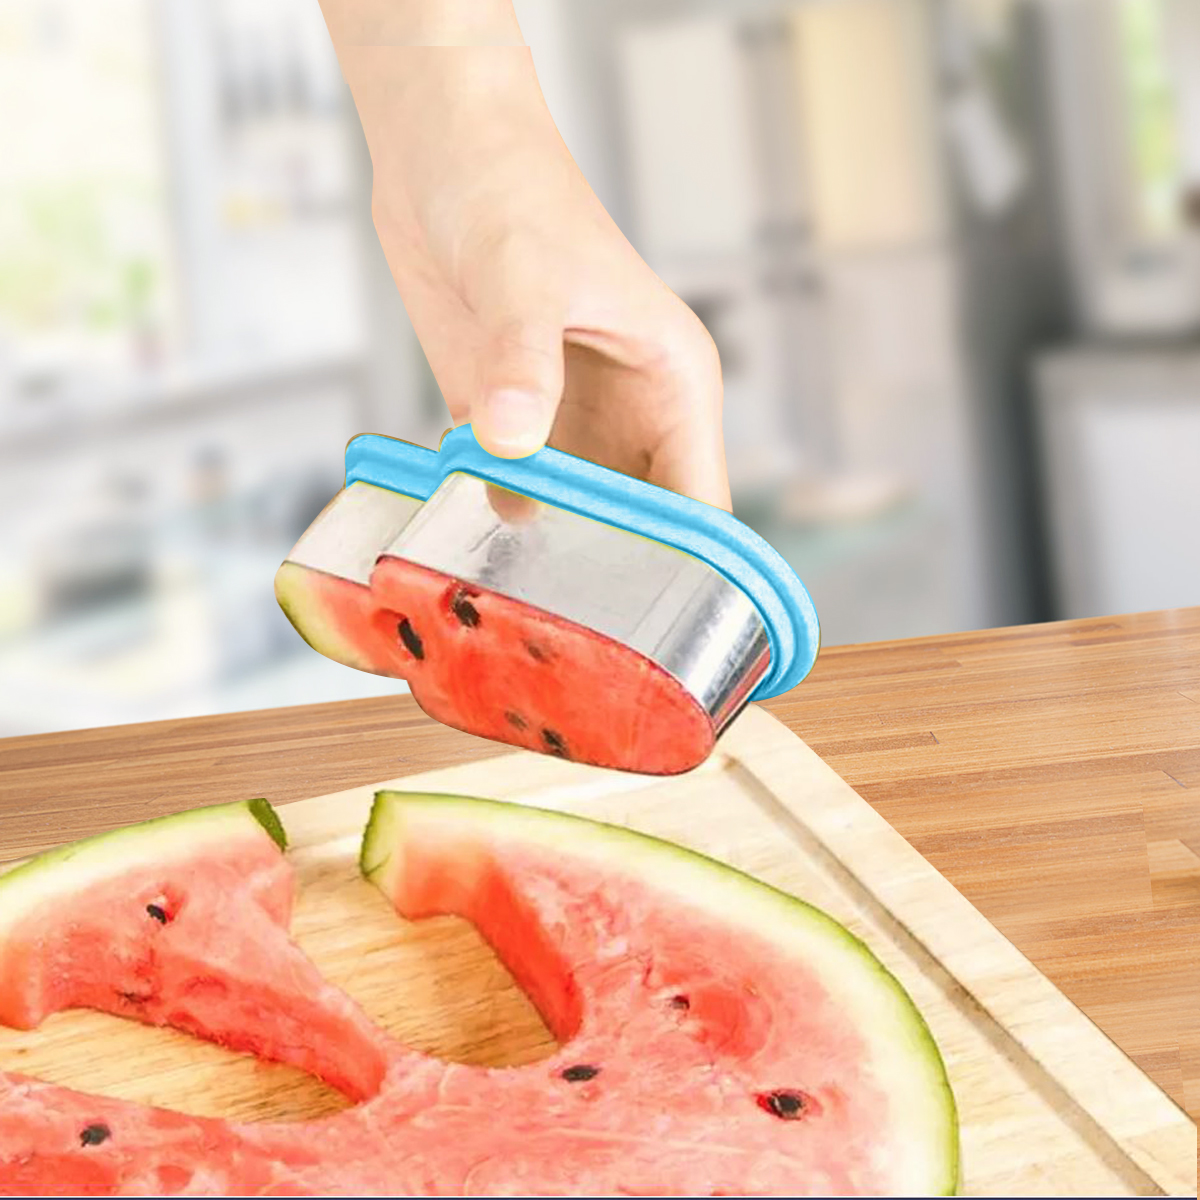 Watermelon Slicer Stainless Steel - Fun Fruit Cutter